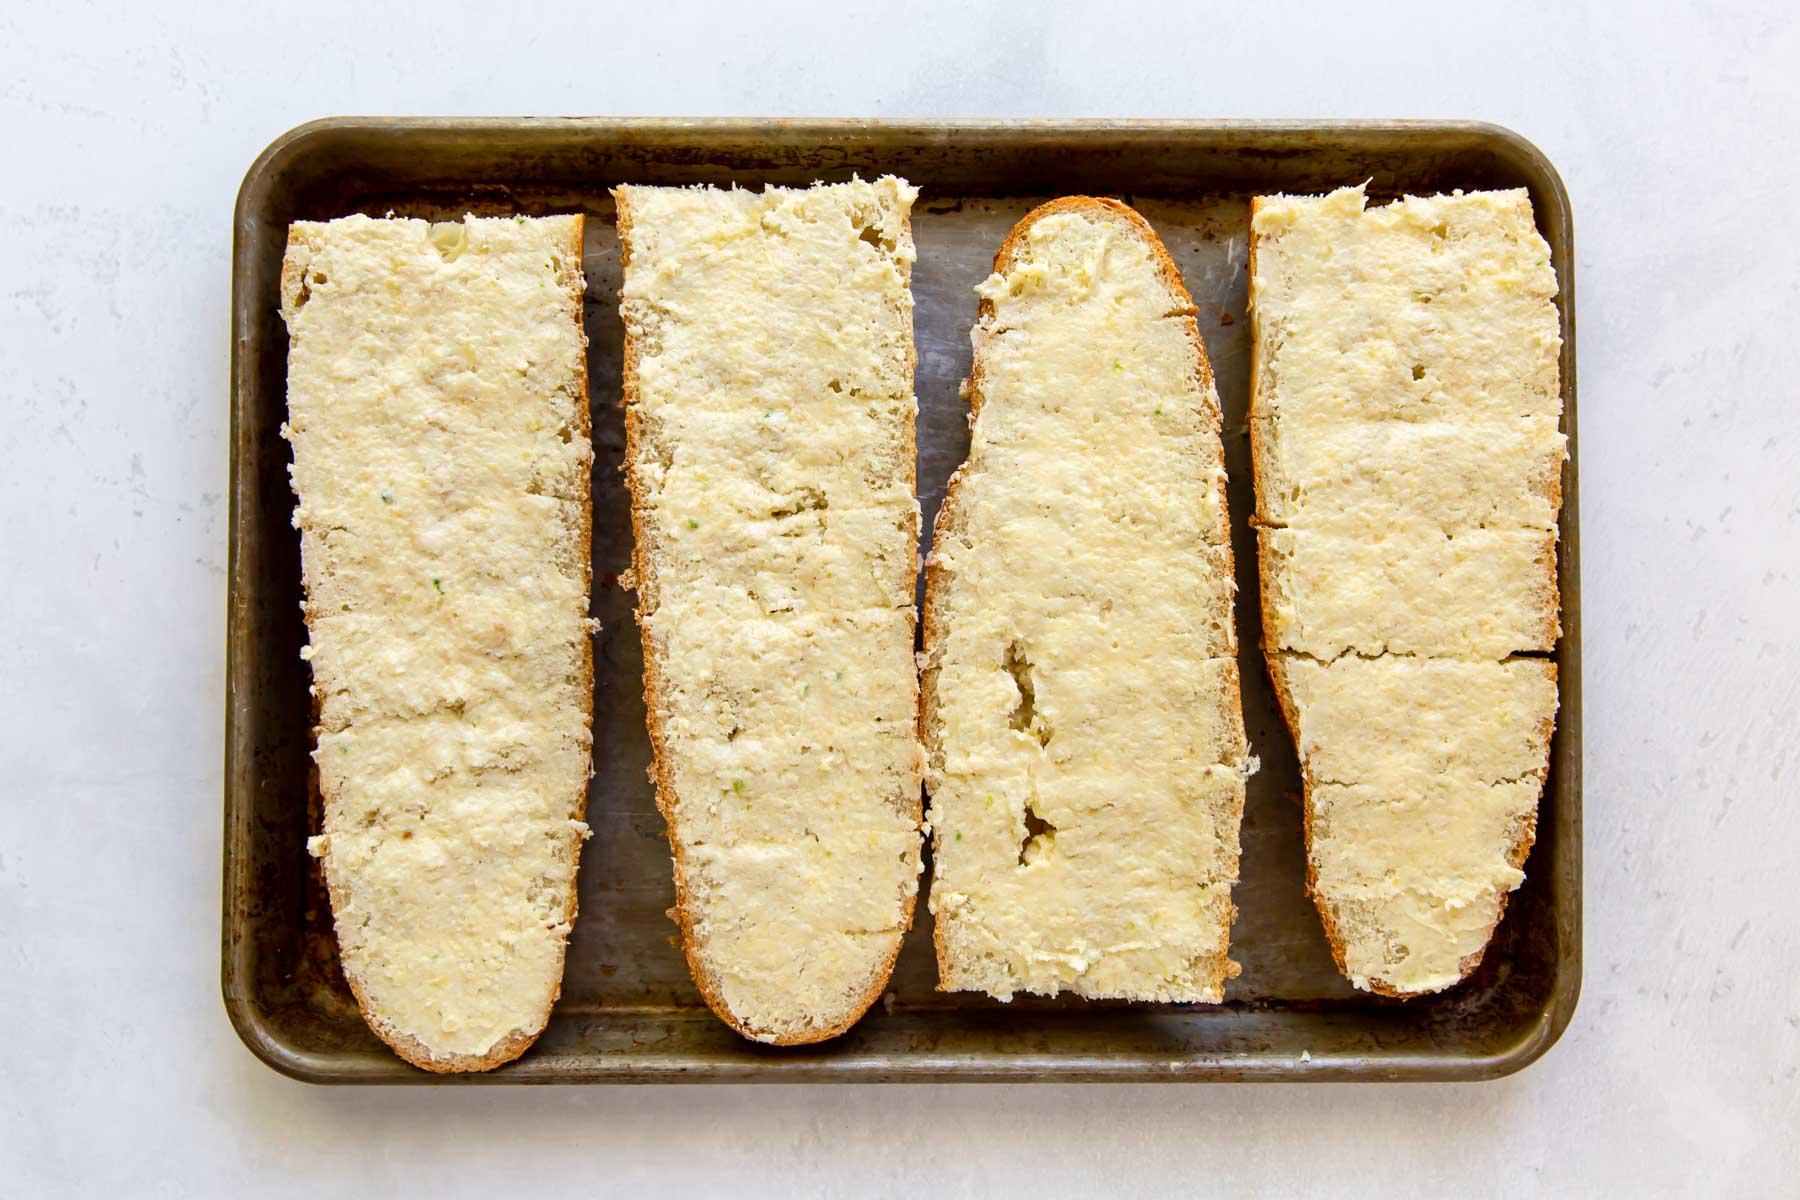 garlic butter spread on french bread on baking sheet